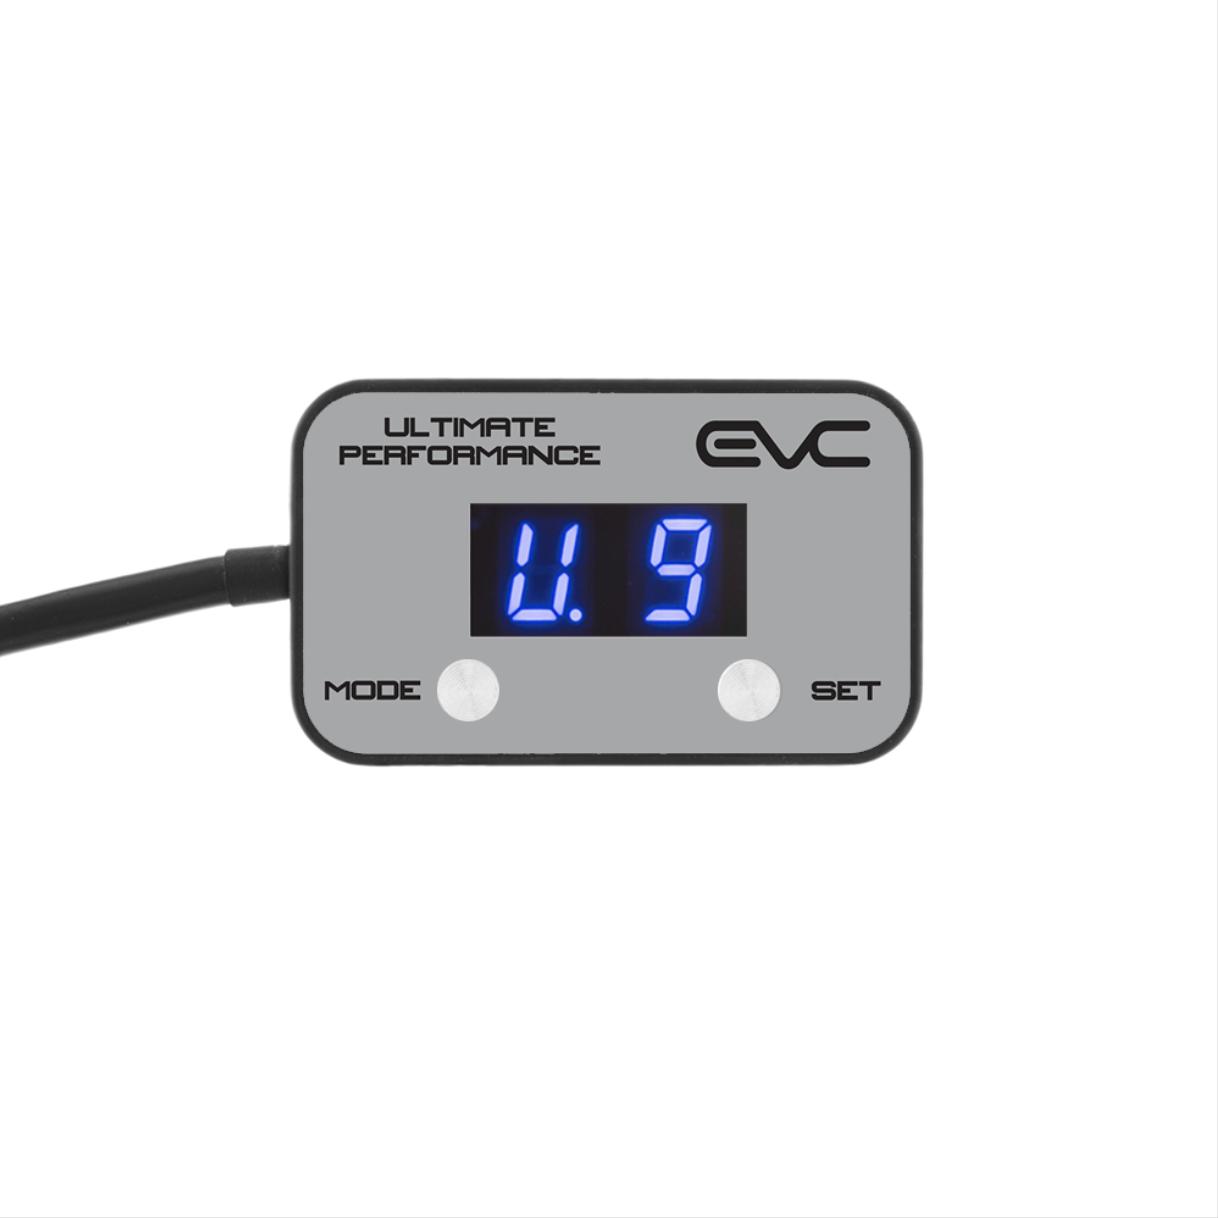 EVC iDrive Throttle Controller light grey for Mercedes Benz R-Class 350 2005-On EVC451